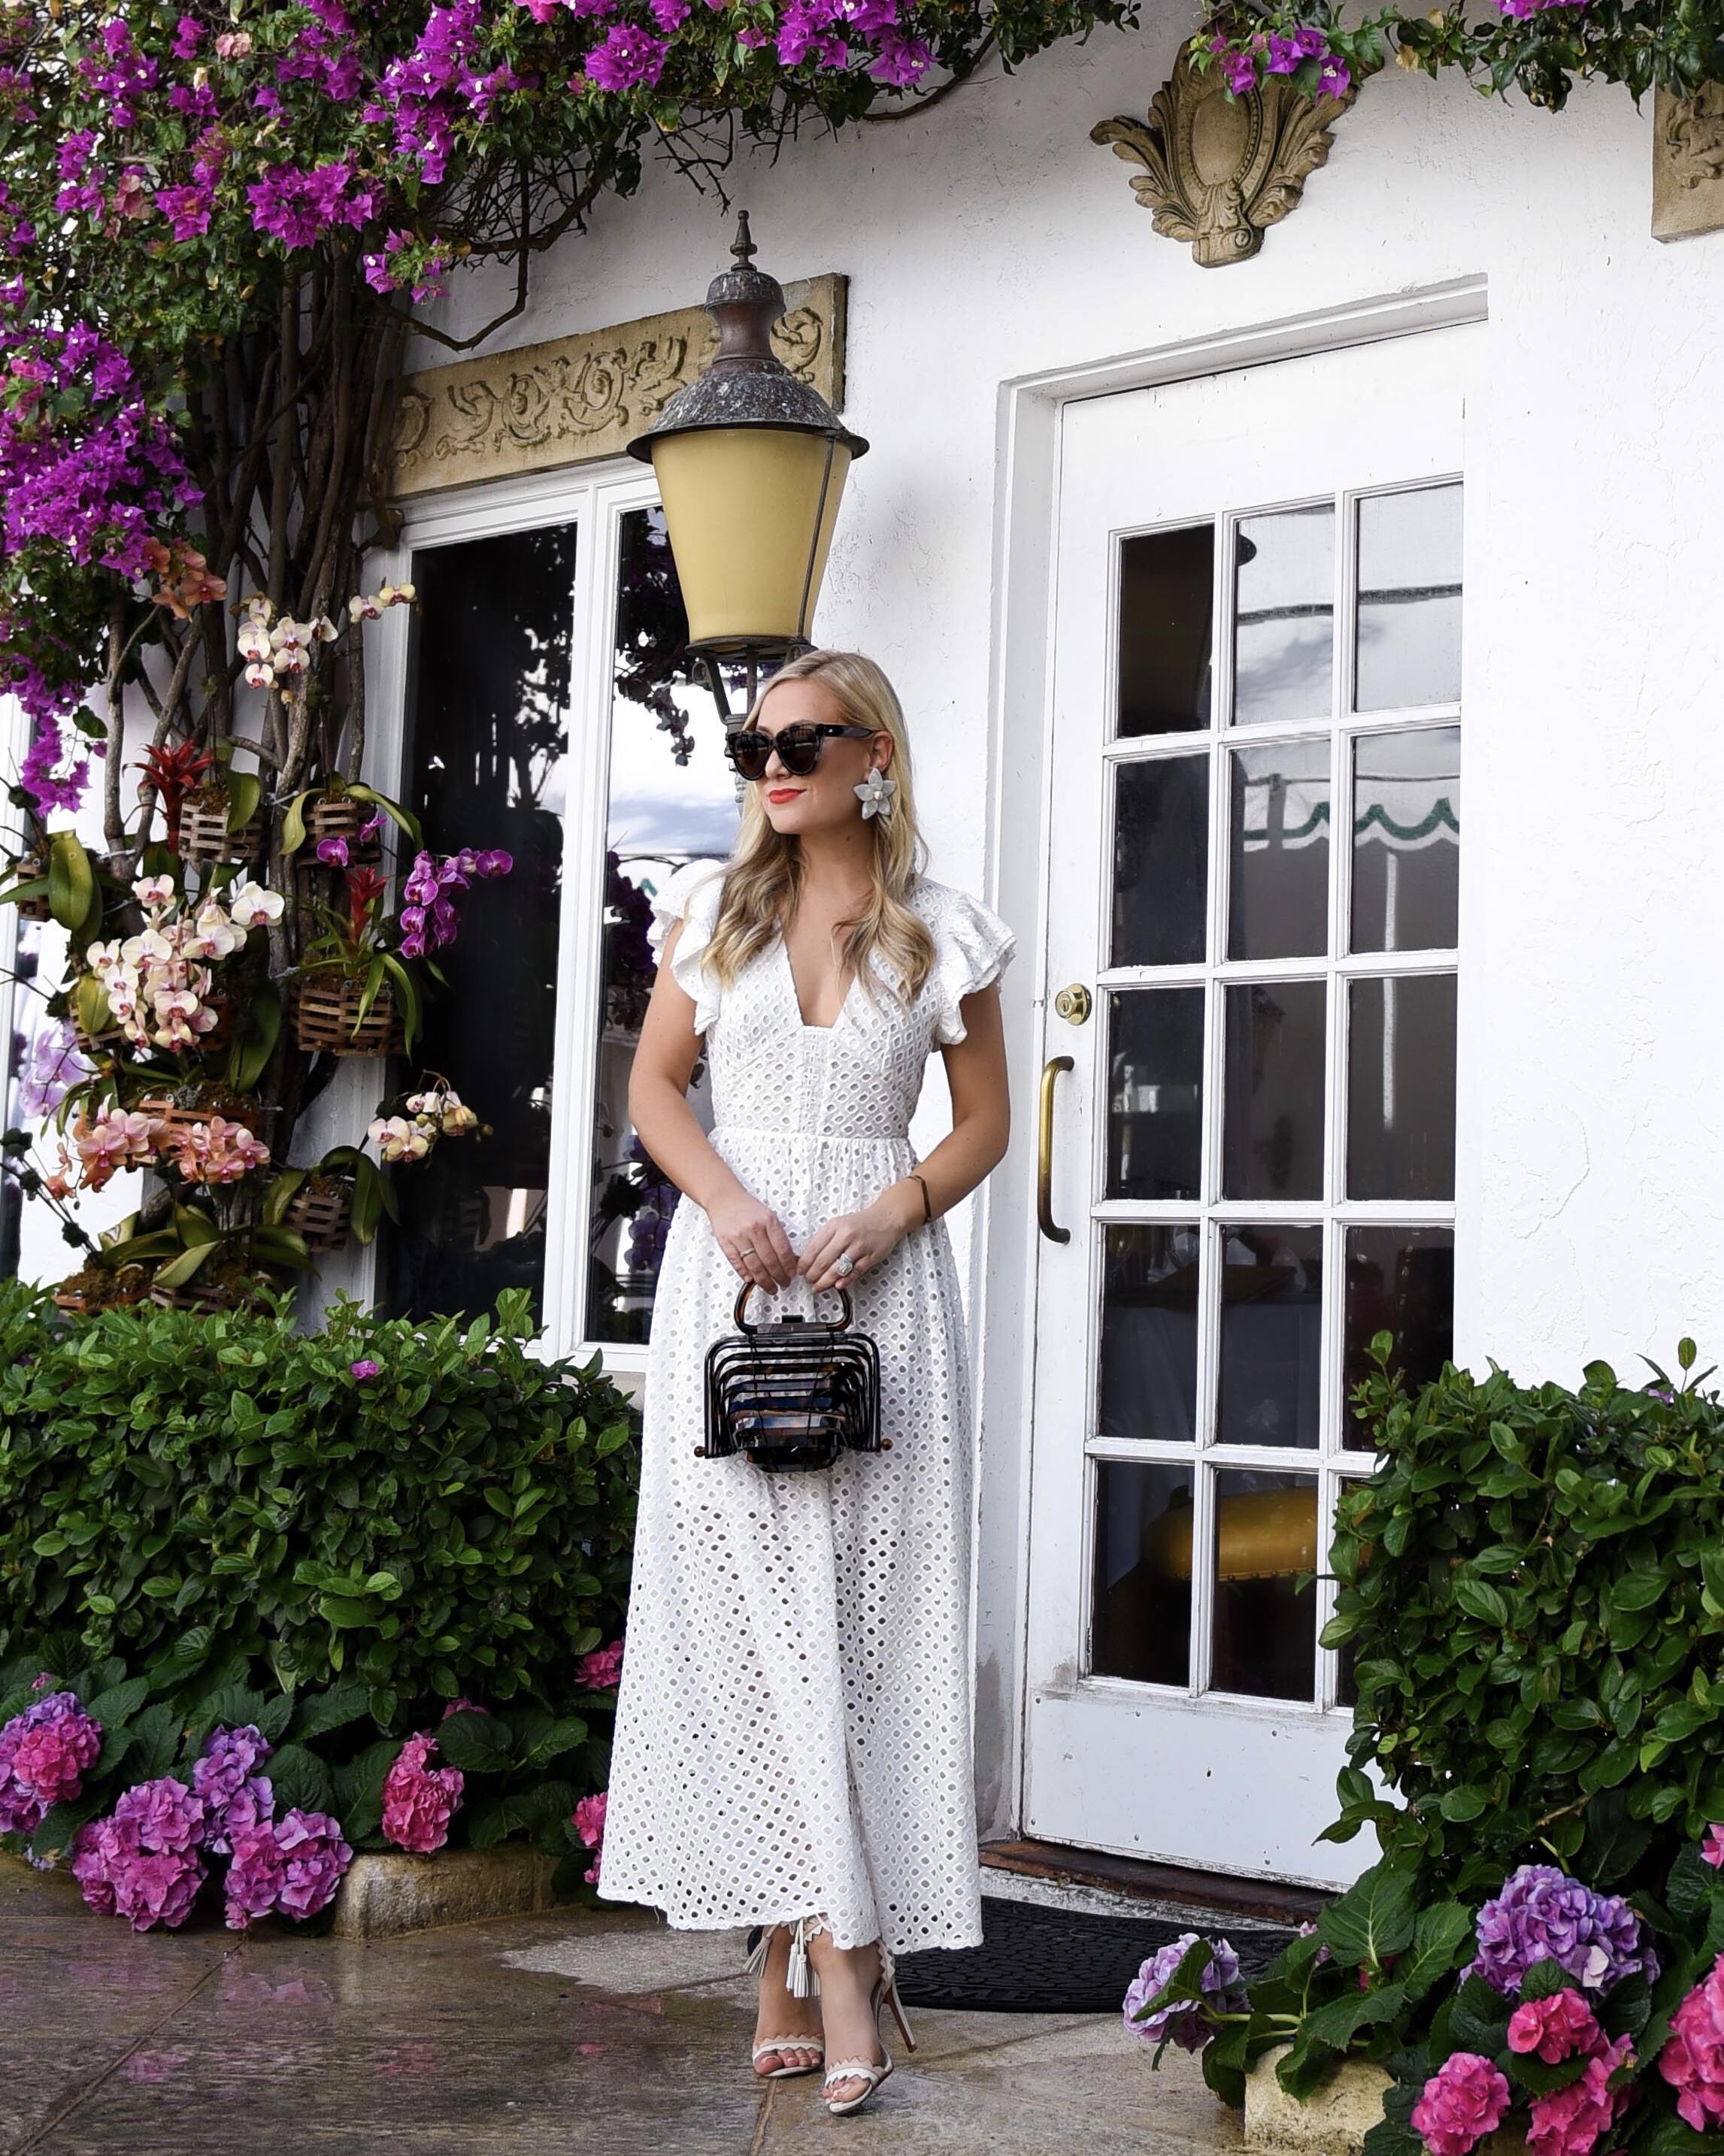 Cult Gaia Bag, Shopbop Sale, Endless Rose Dress, Schutz Sandals